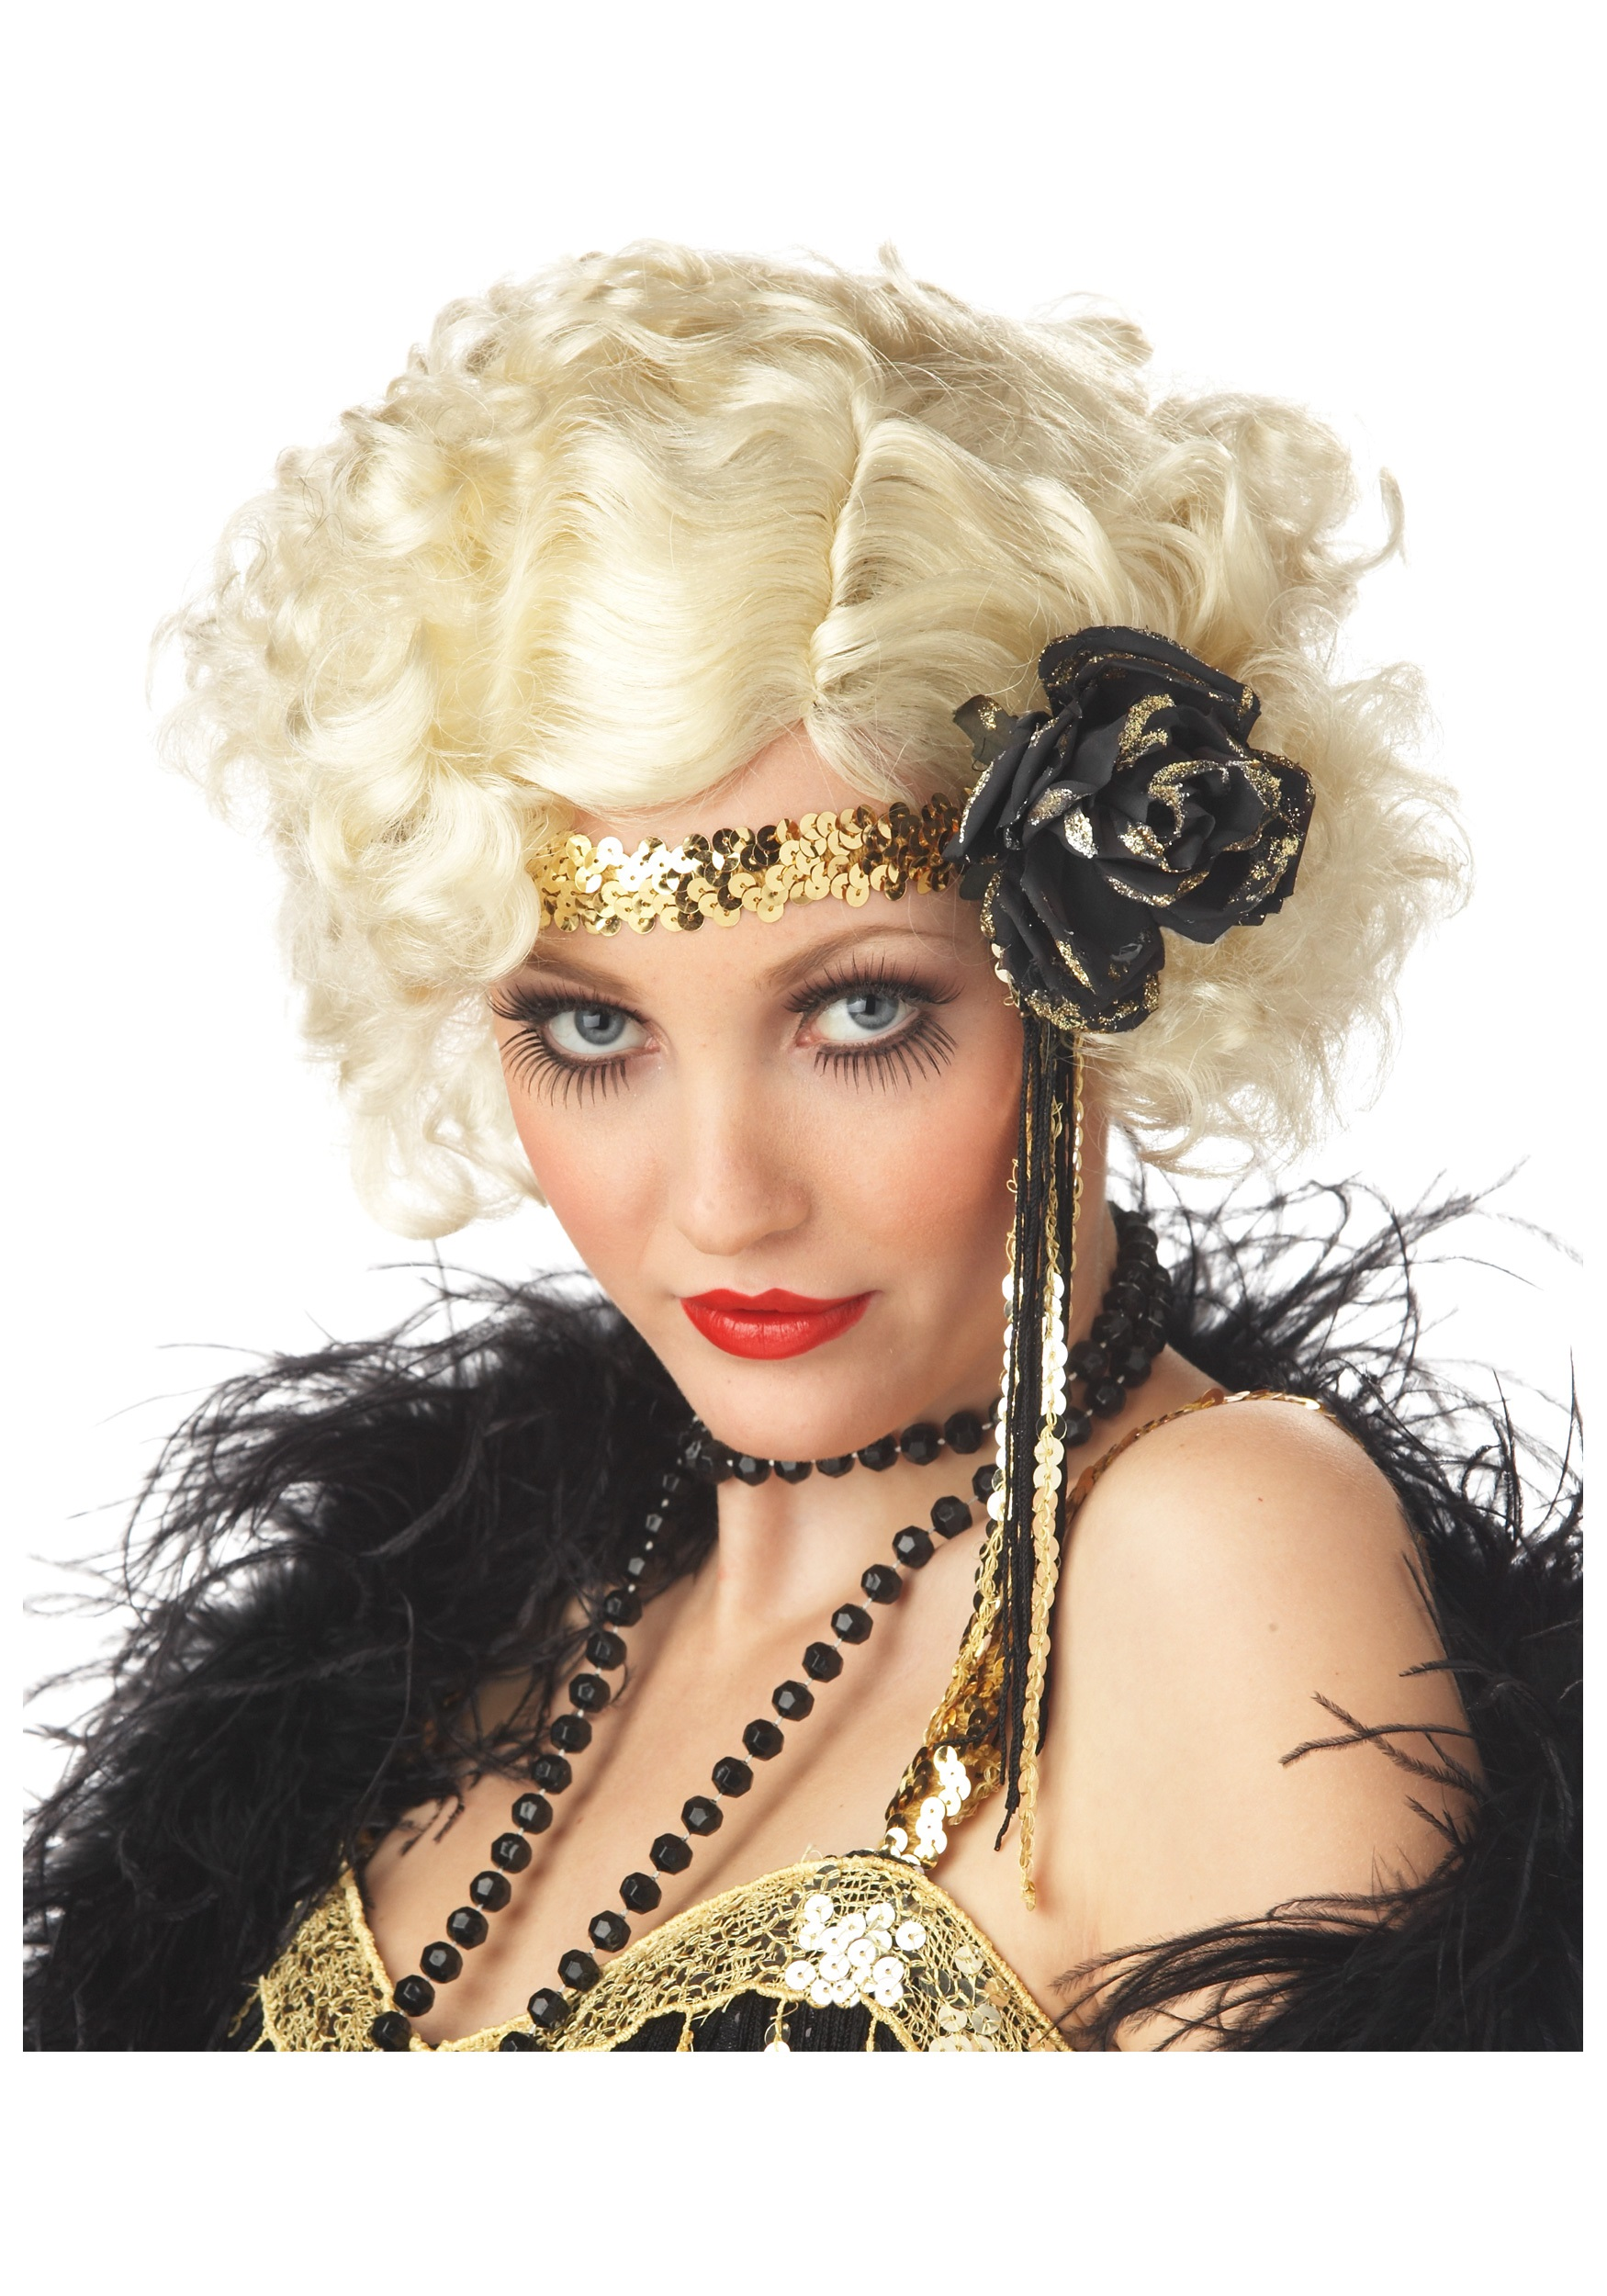 Lady Gaga Costumes - Lady Gaga Halloween Costume Ideas